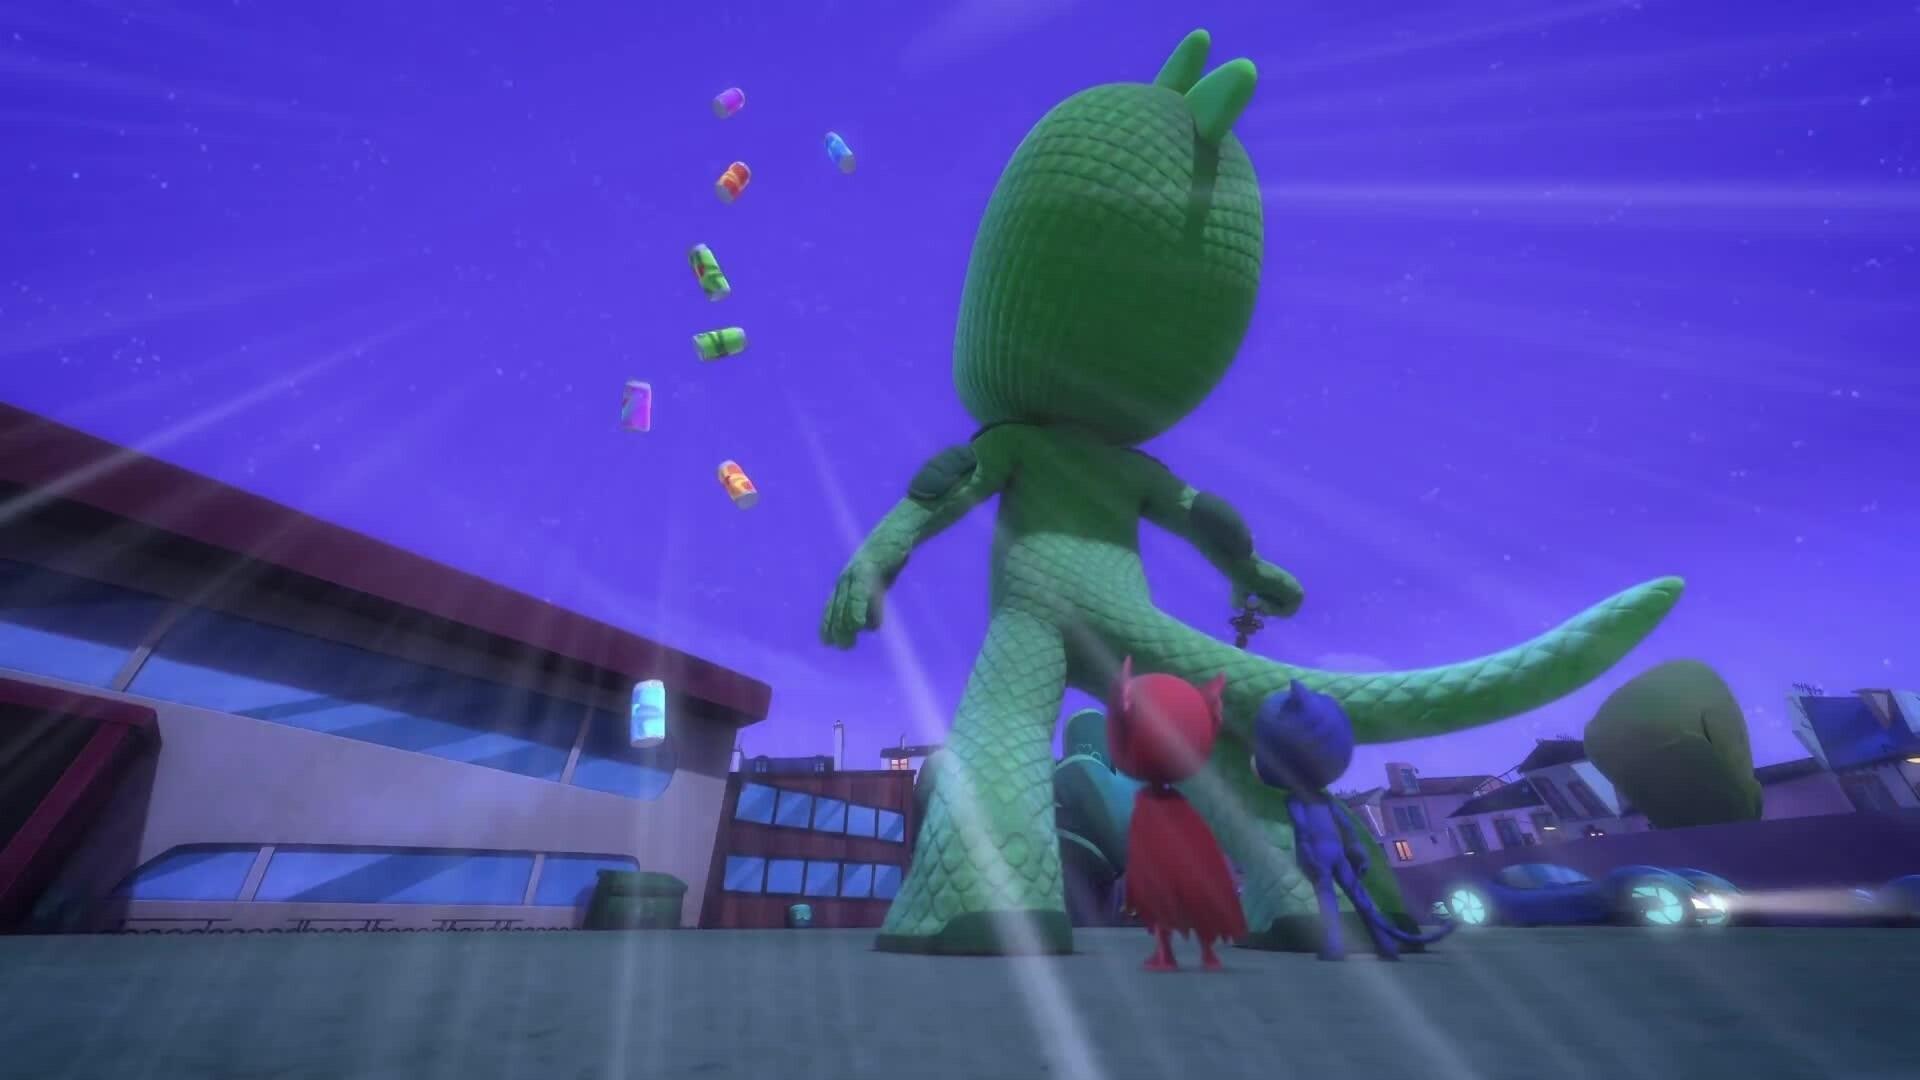 PJ Masks - Pyjamahelden - Riesen-Gecko/Eulette, die Meisterpilotin